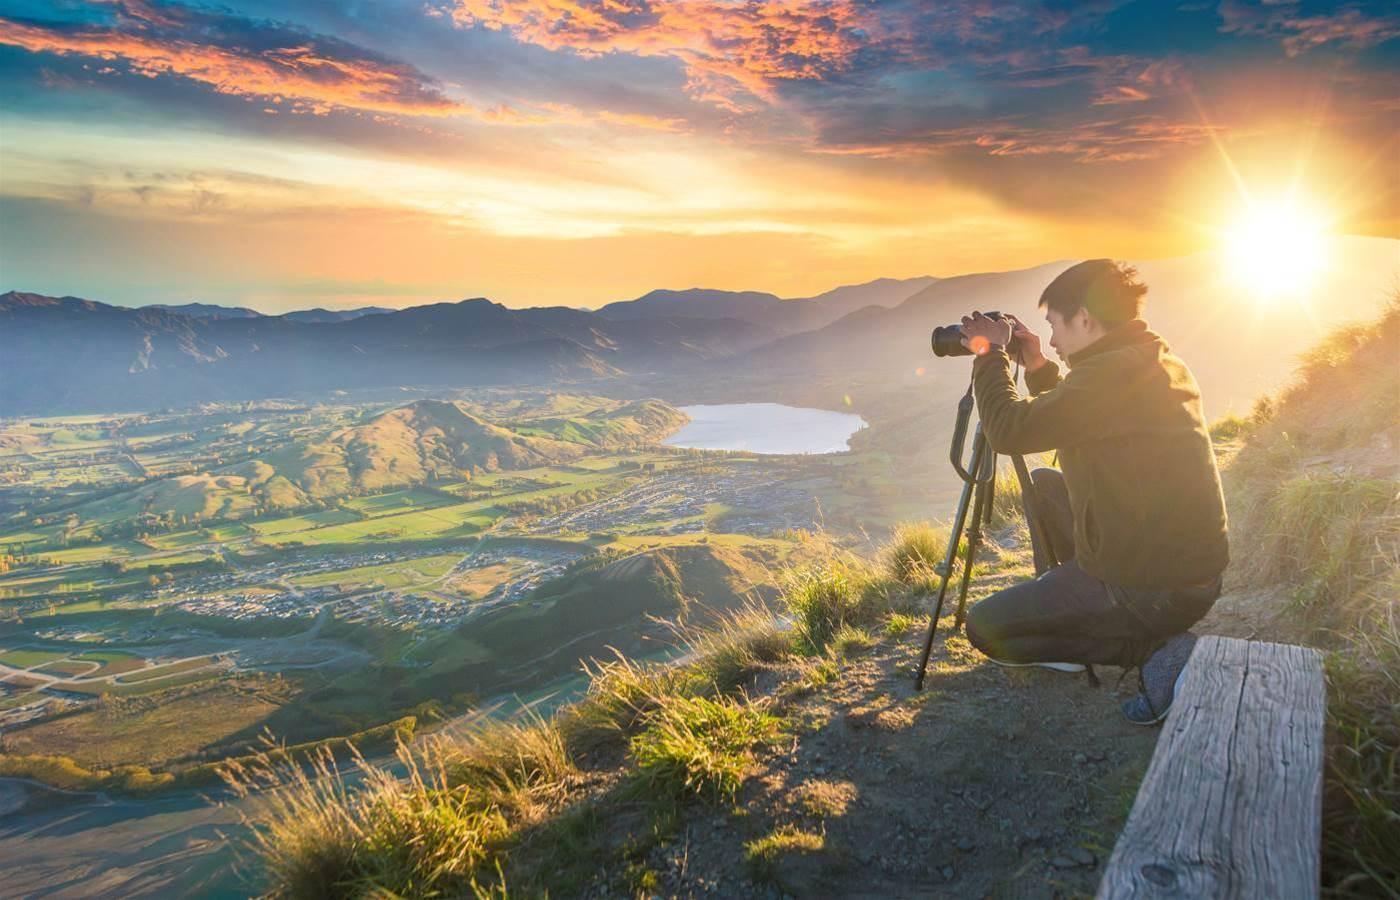 Melbourne-based digital marketplace Envato acquires stock photo company Twenty20